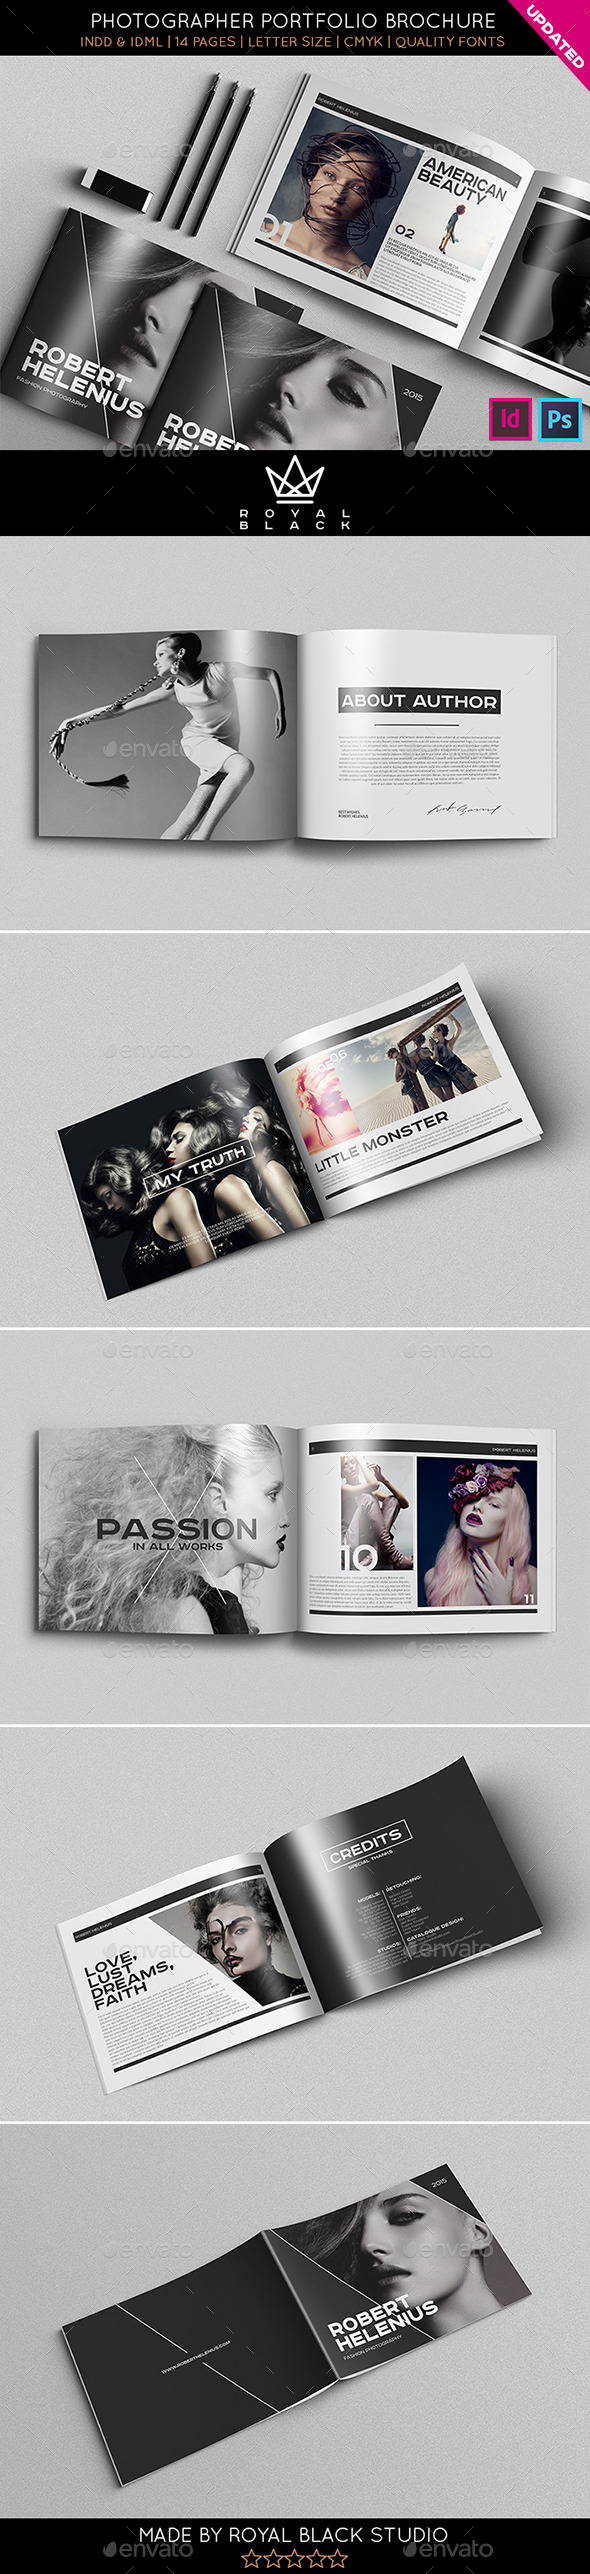 Portfolio Brochure Vol.5 - Portfolio Brochures